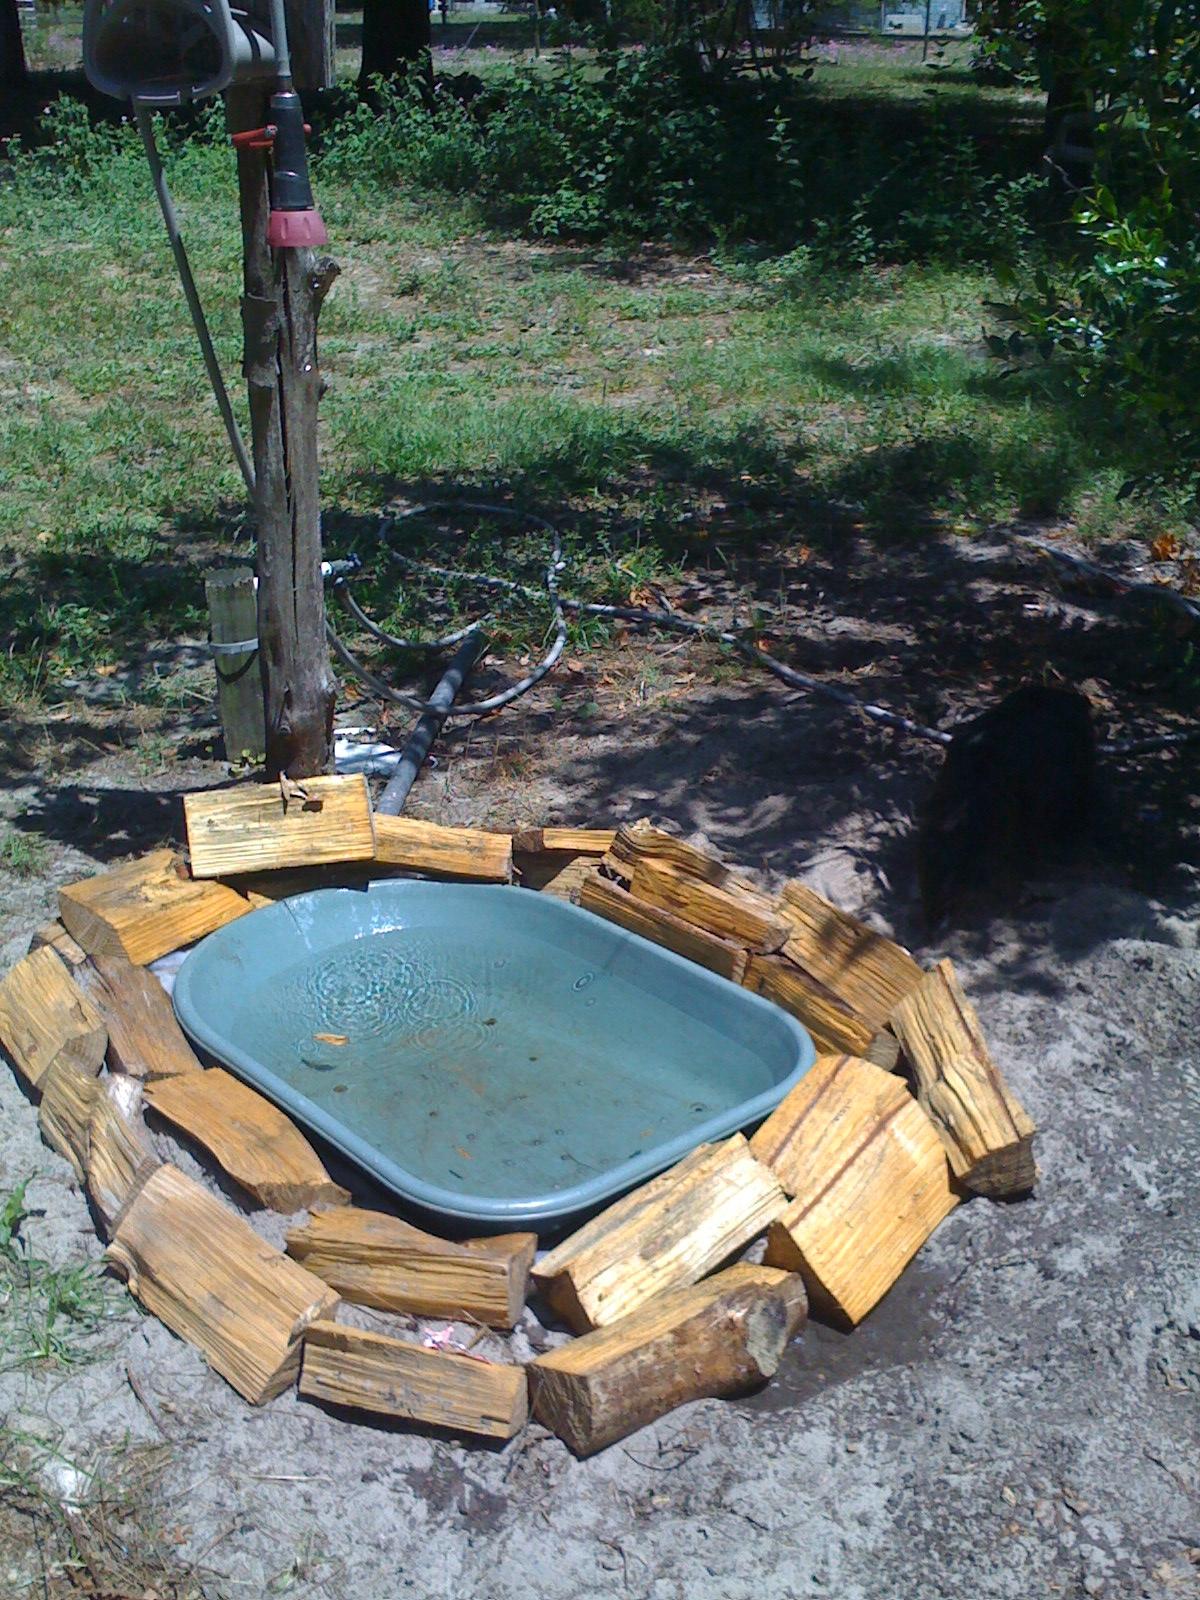 How to make a birdbath - Zeevah S Elite Doggie Swimming Pool Water Bowl Bird Bath